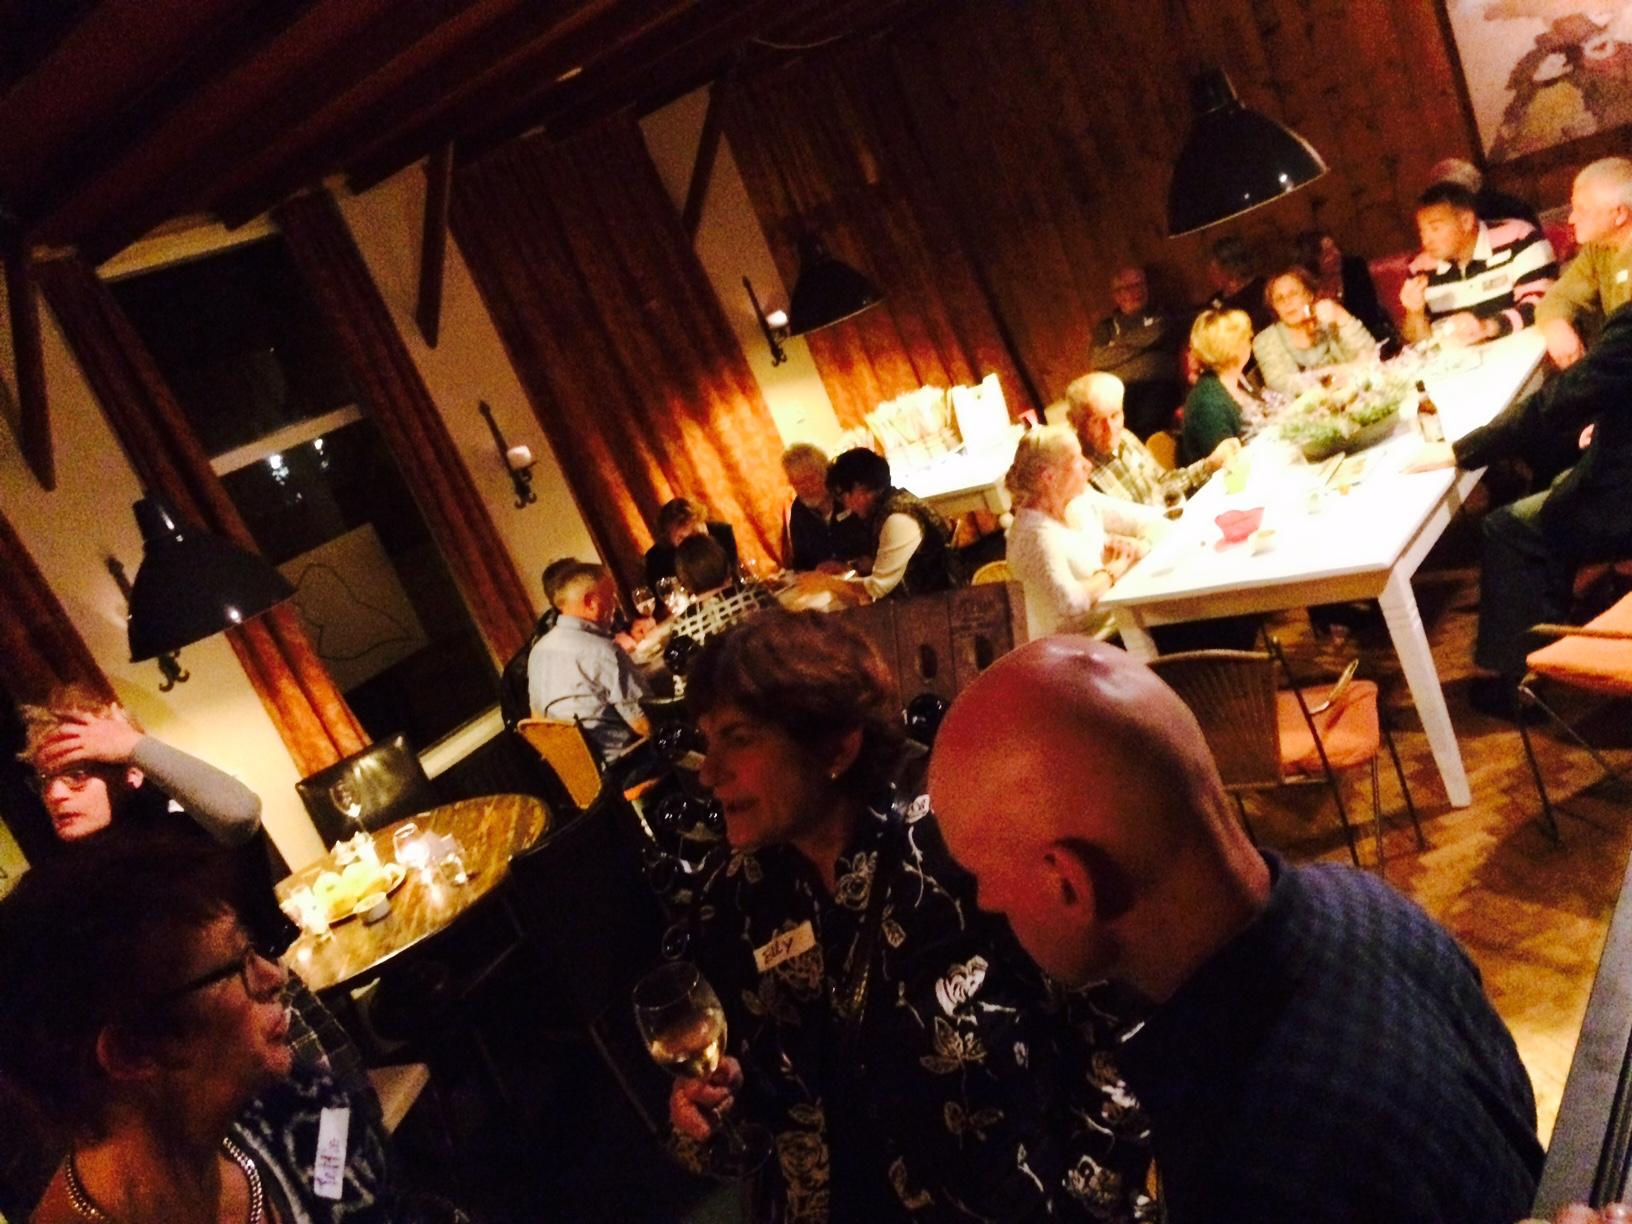 singlecafe in brasserie van Rest.Kawop,Markt 23,Lochem 31-10-14